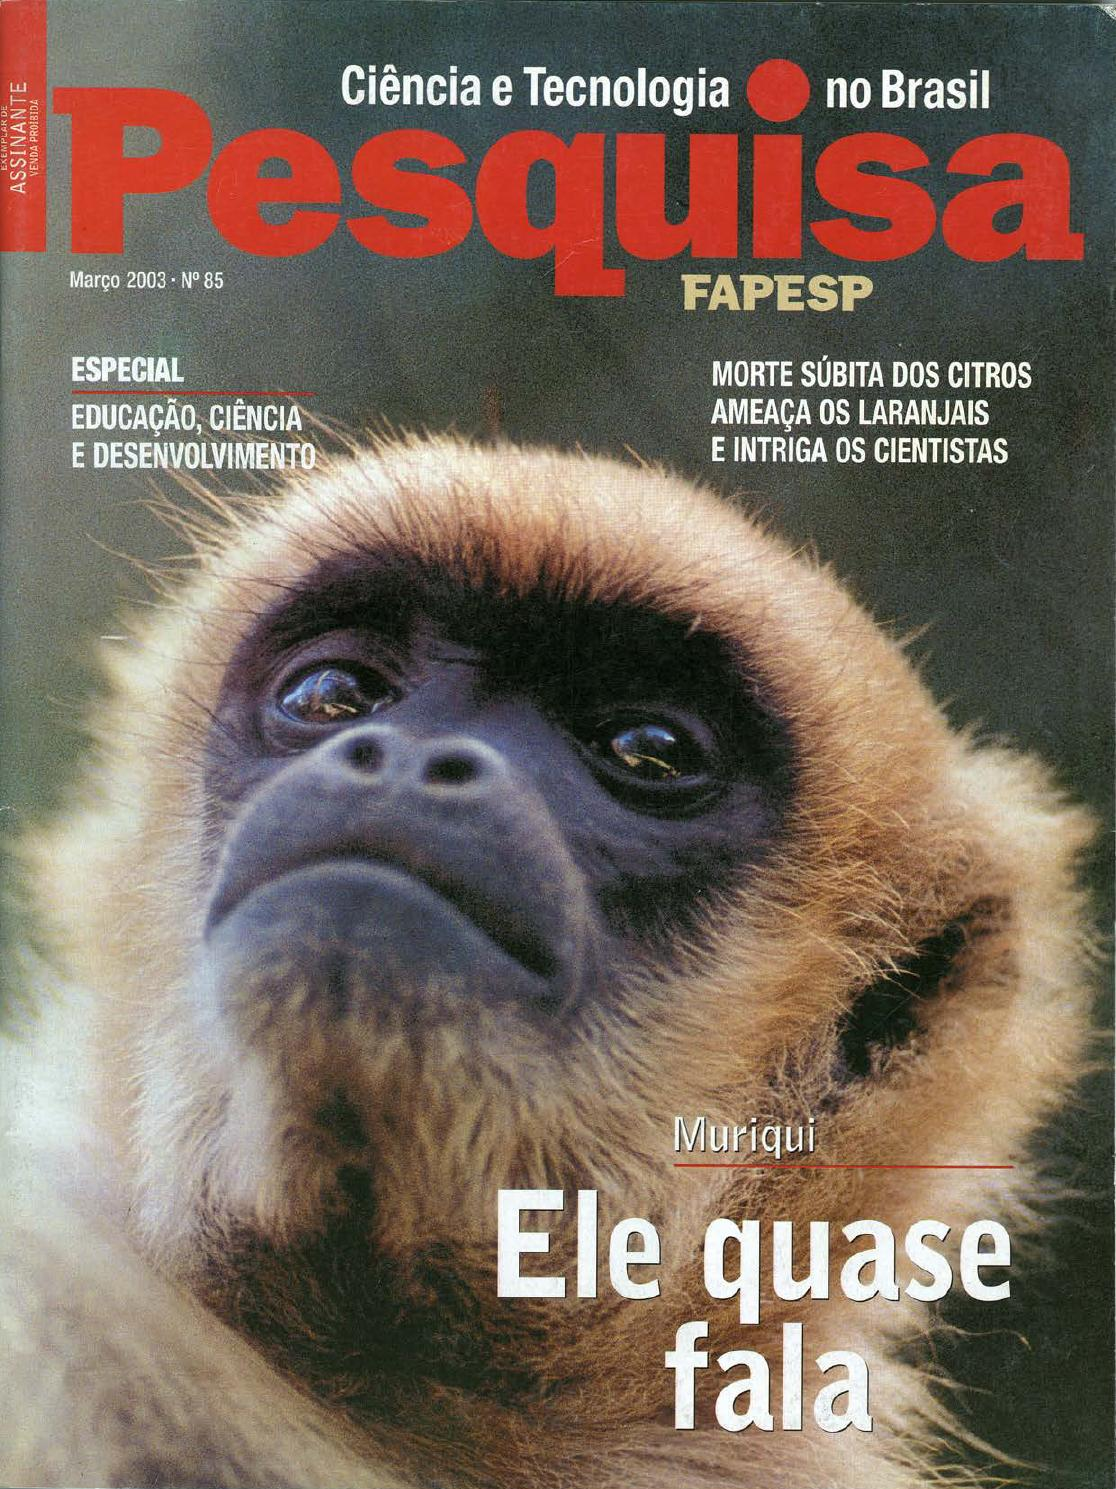 b8b65b13c79 Ele quase fala by Pesquisa Fapesp - issuu